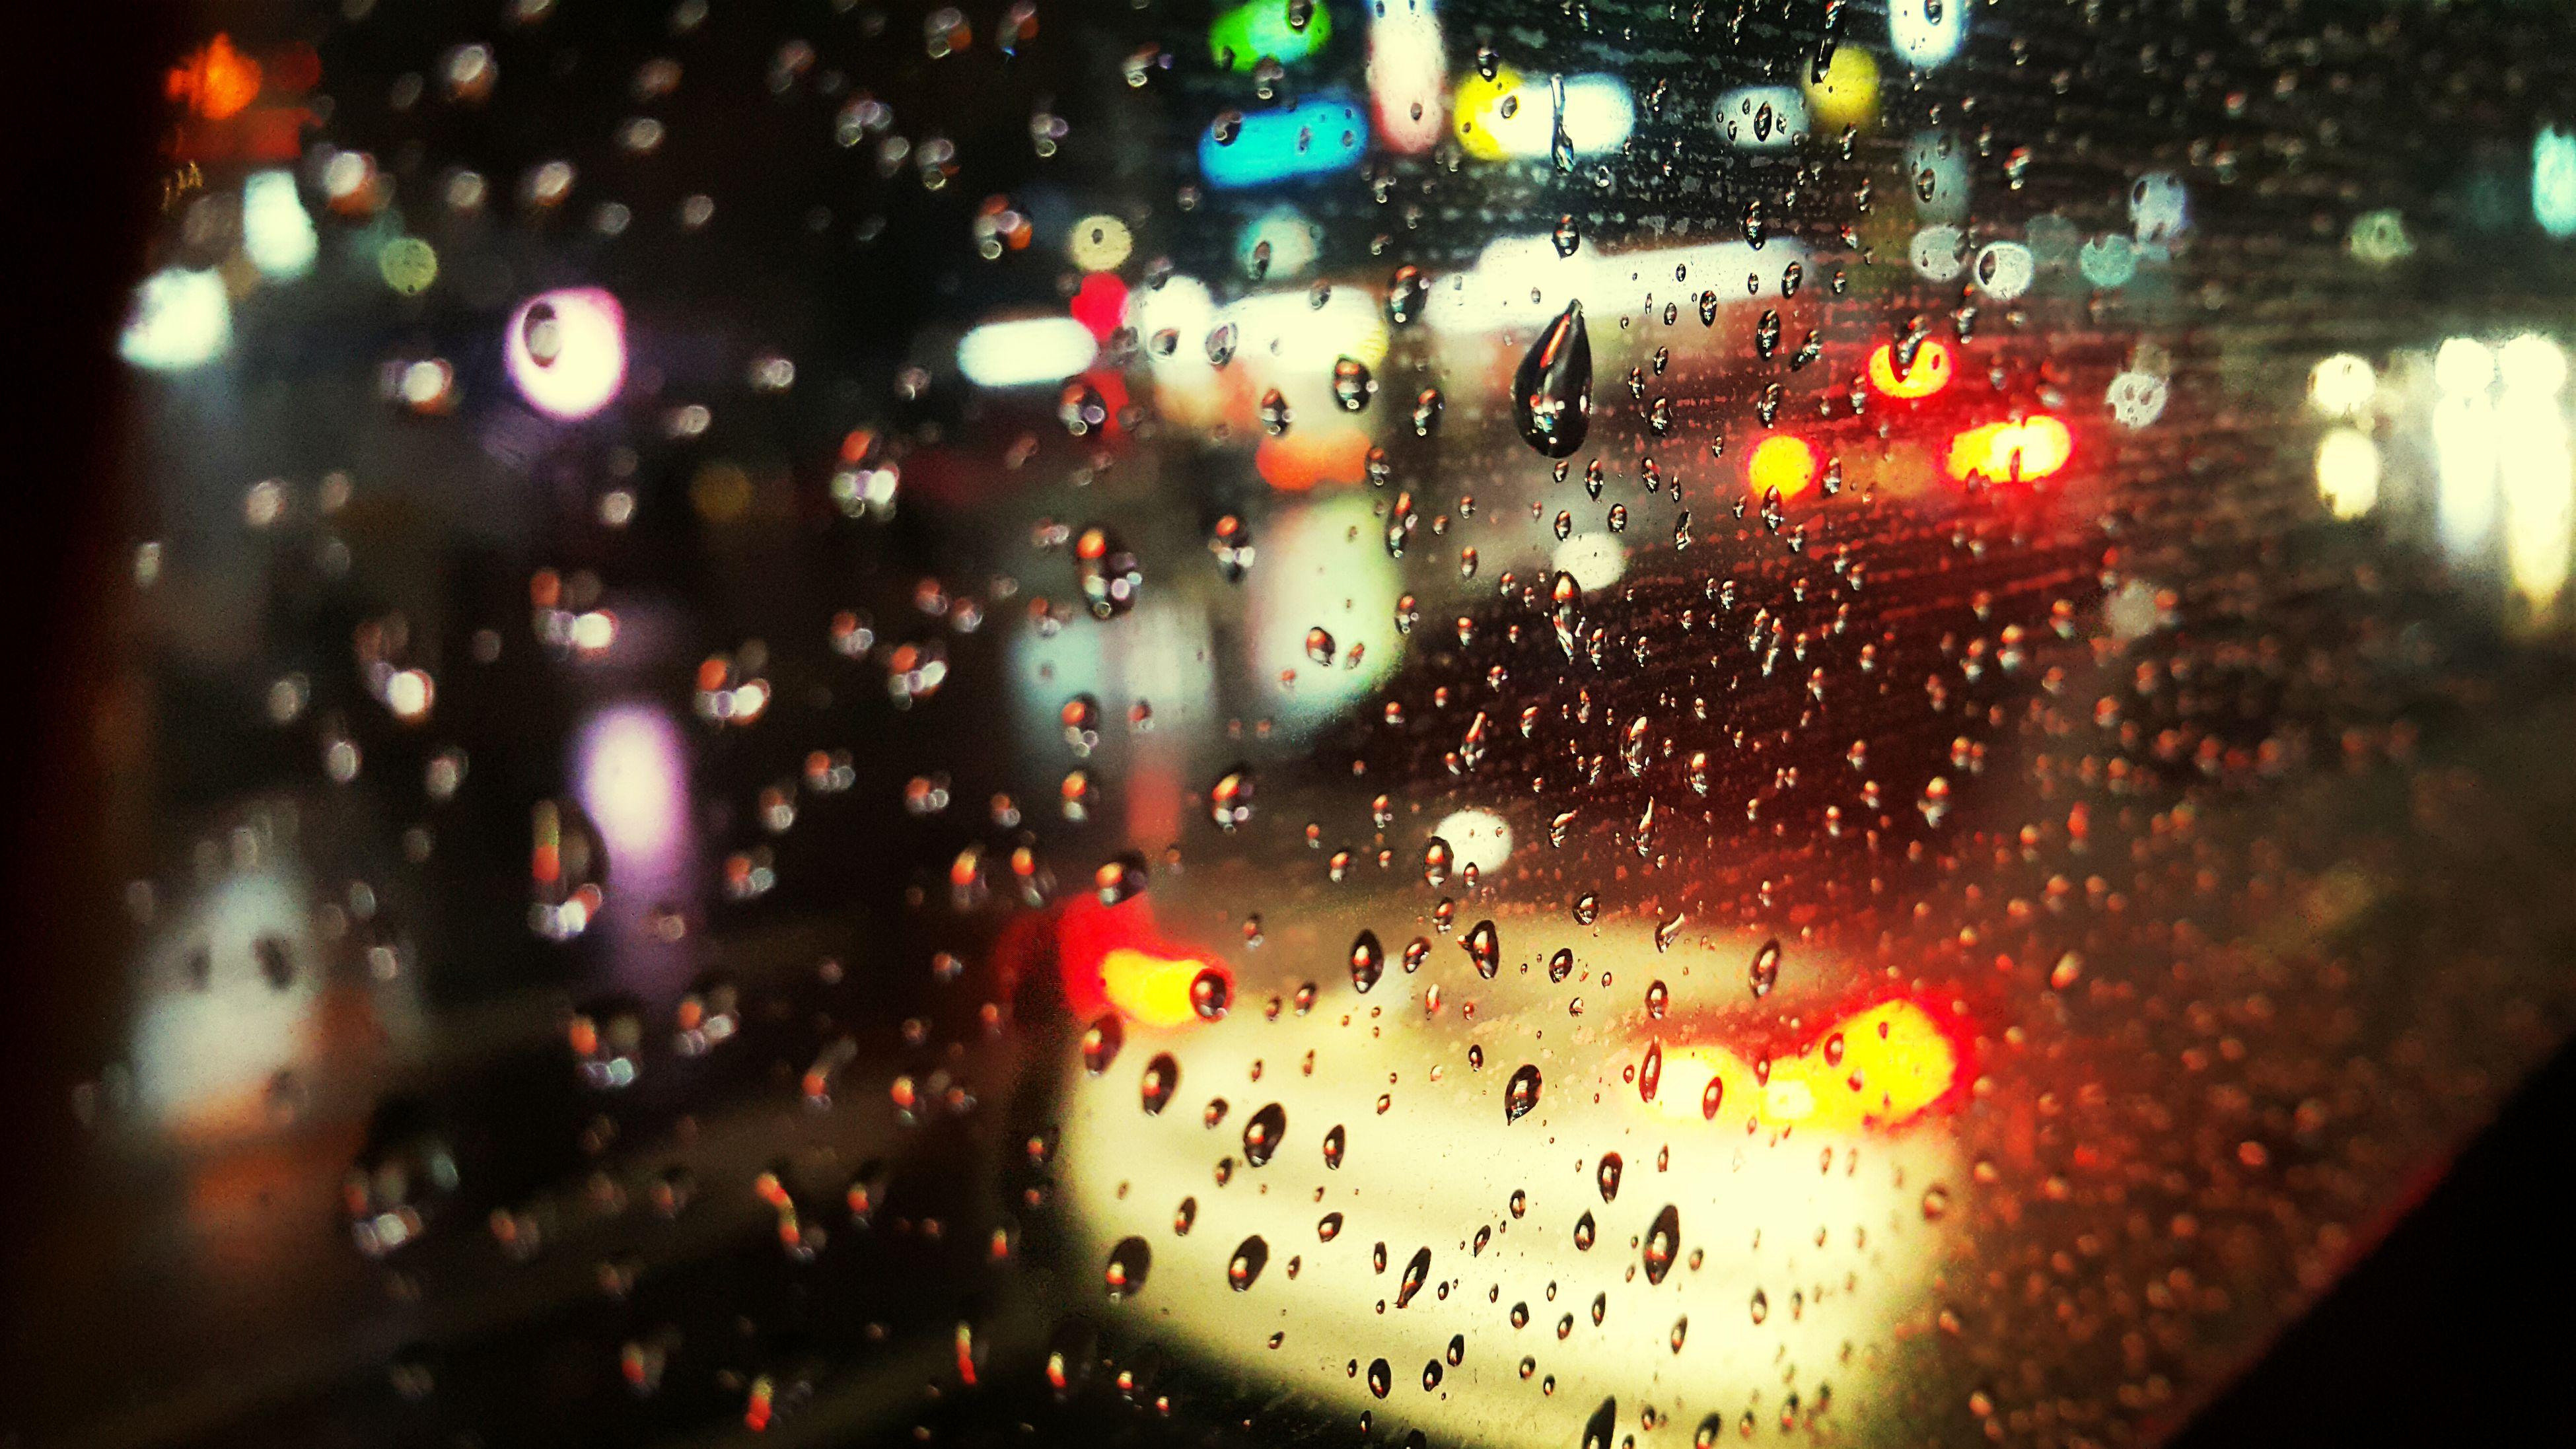 illuminated, night, car, wet, city, window, indoors, land vehicle, rain, street, transportation, city street, architecture, transparent, glass - material, drop, road, building exterior, traffic, mode of transport